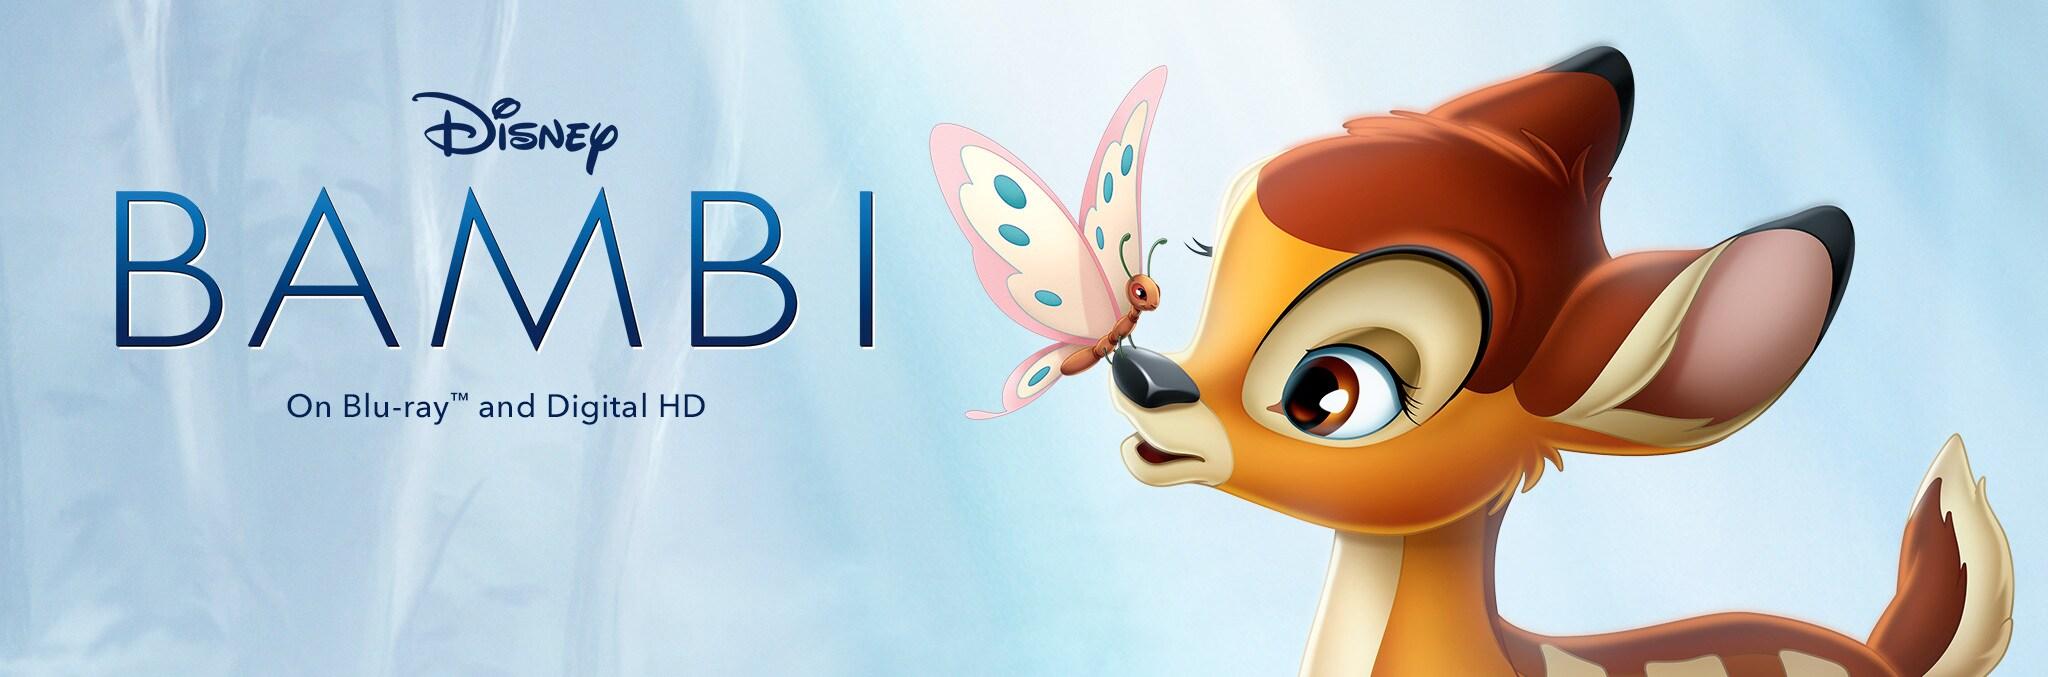 Disney Bambi Faline Coloring